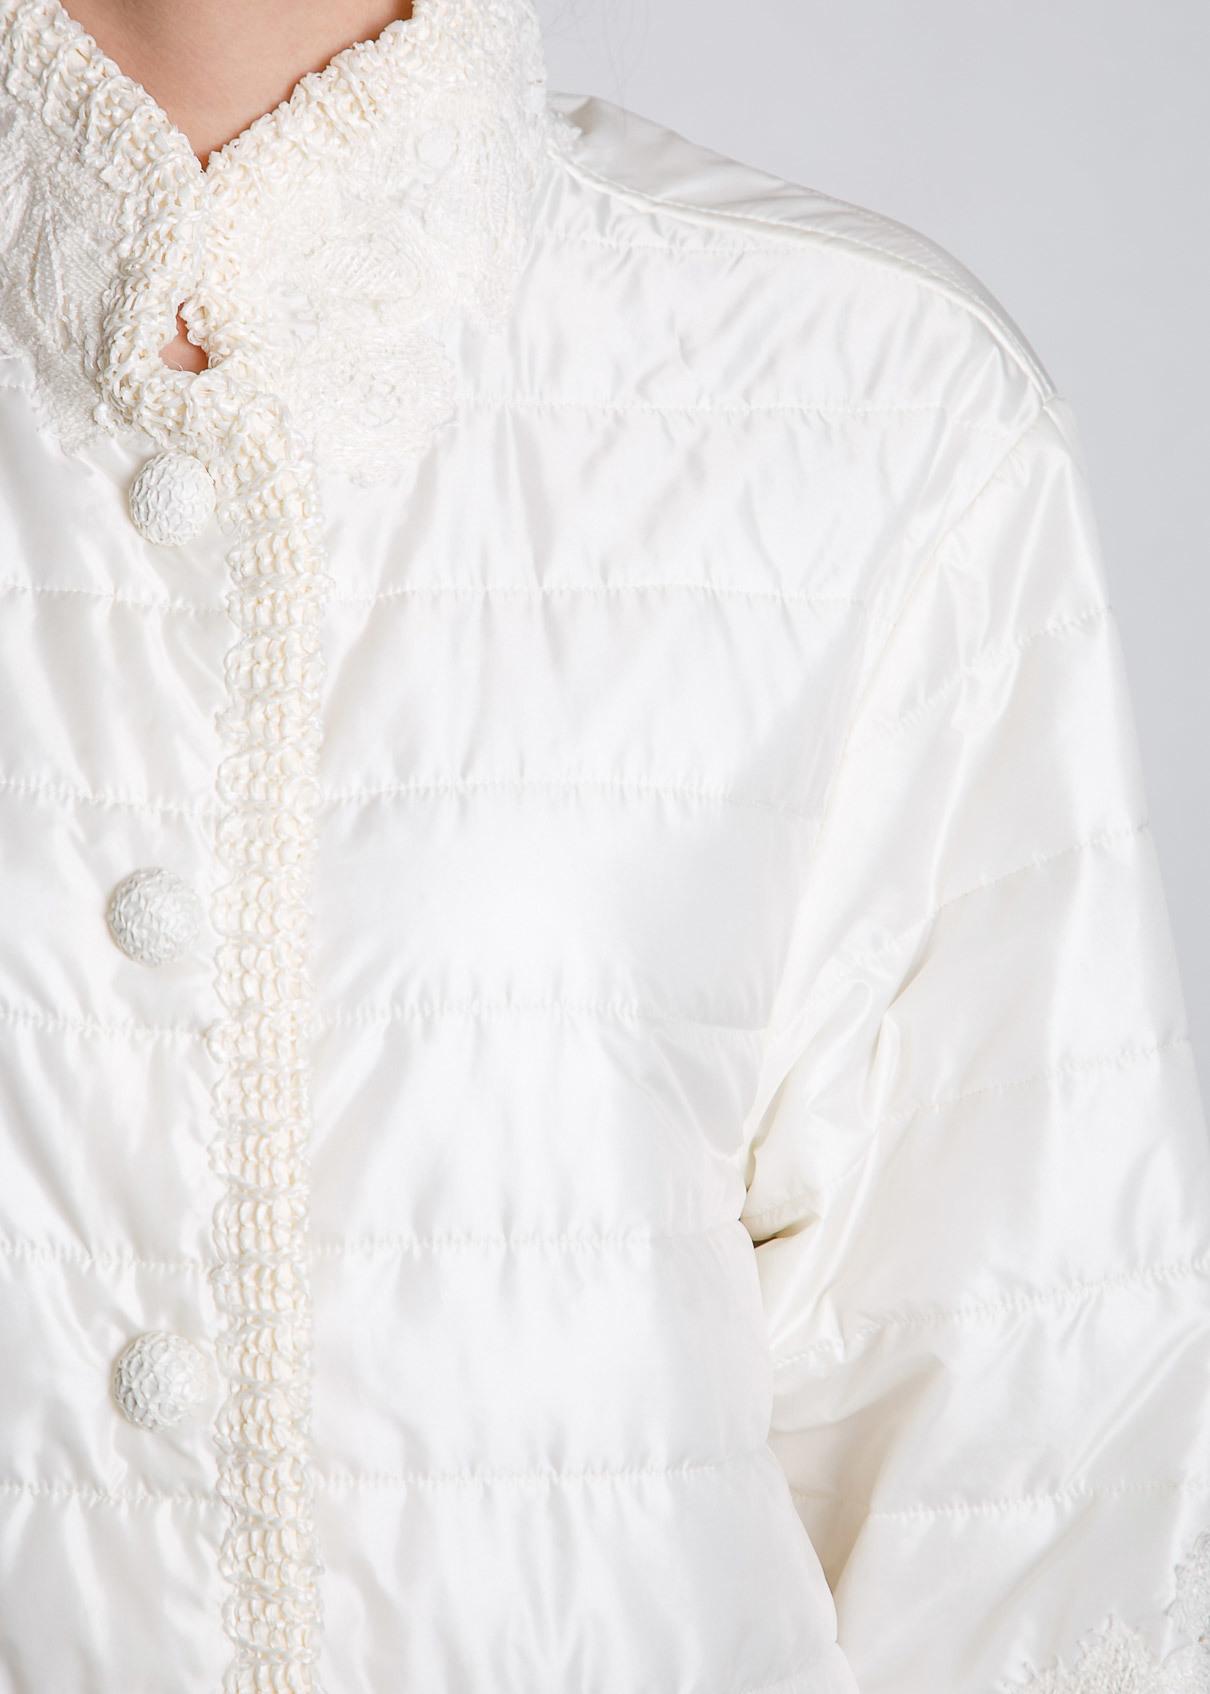 Верхняя одежда весна лето 2017 с доставкой